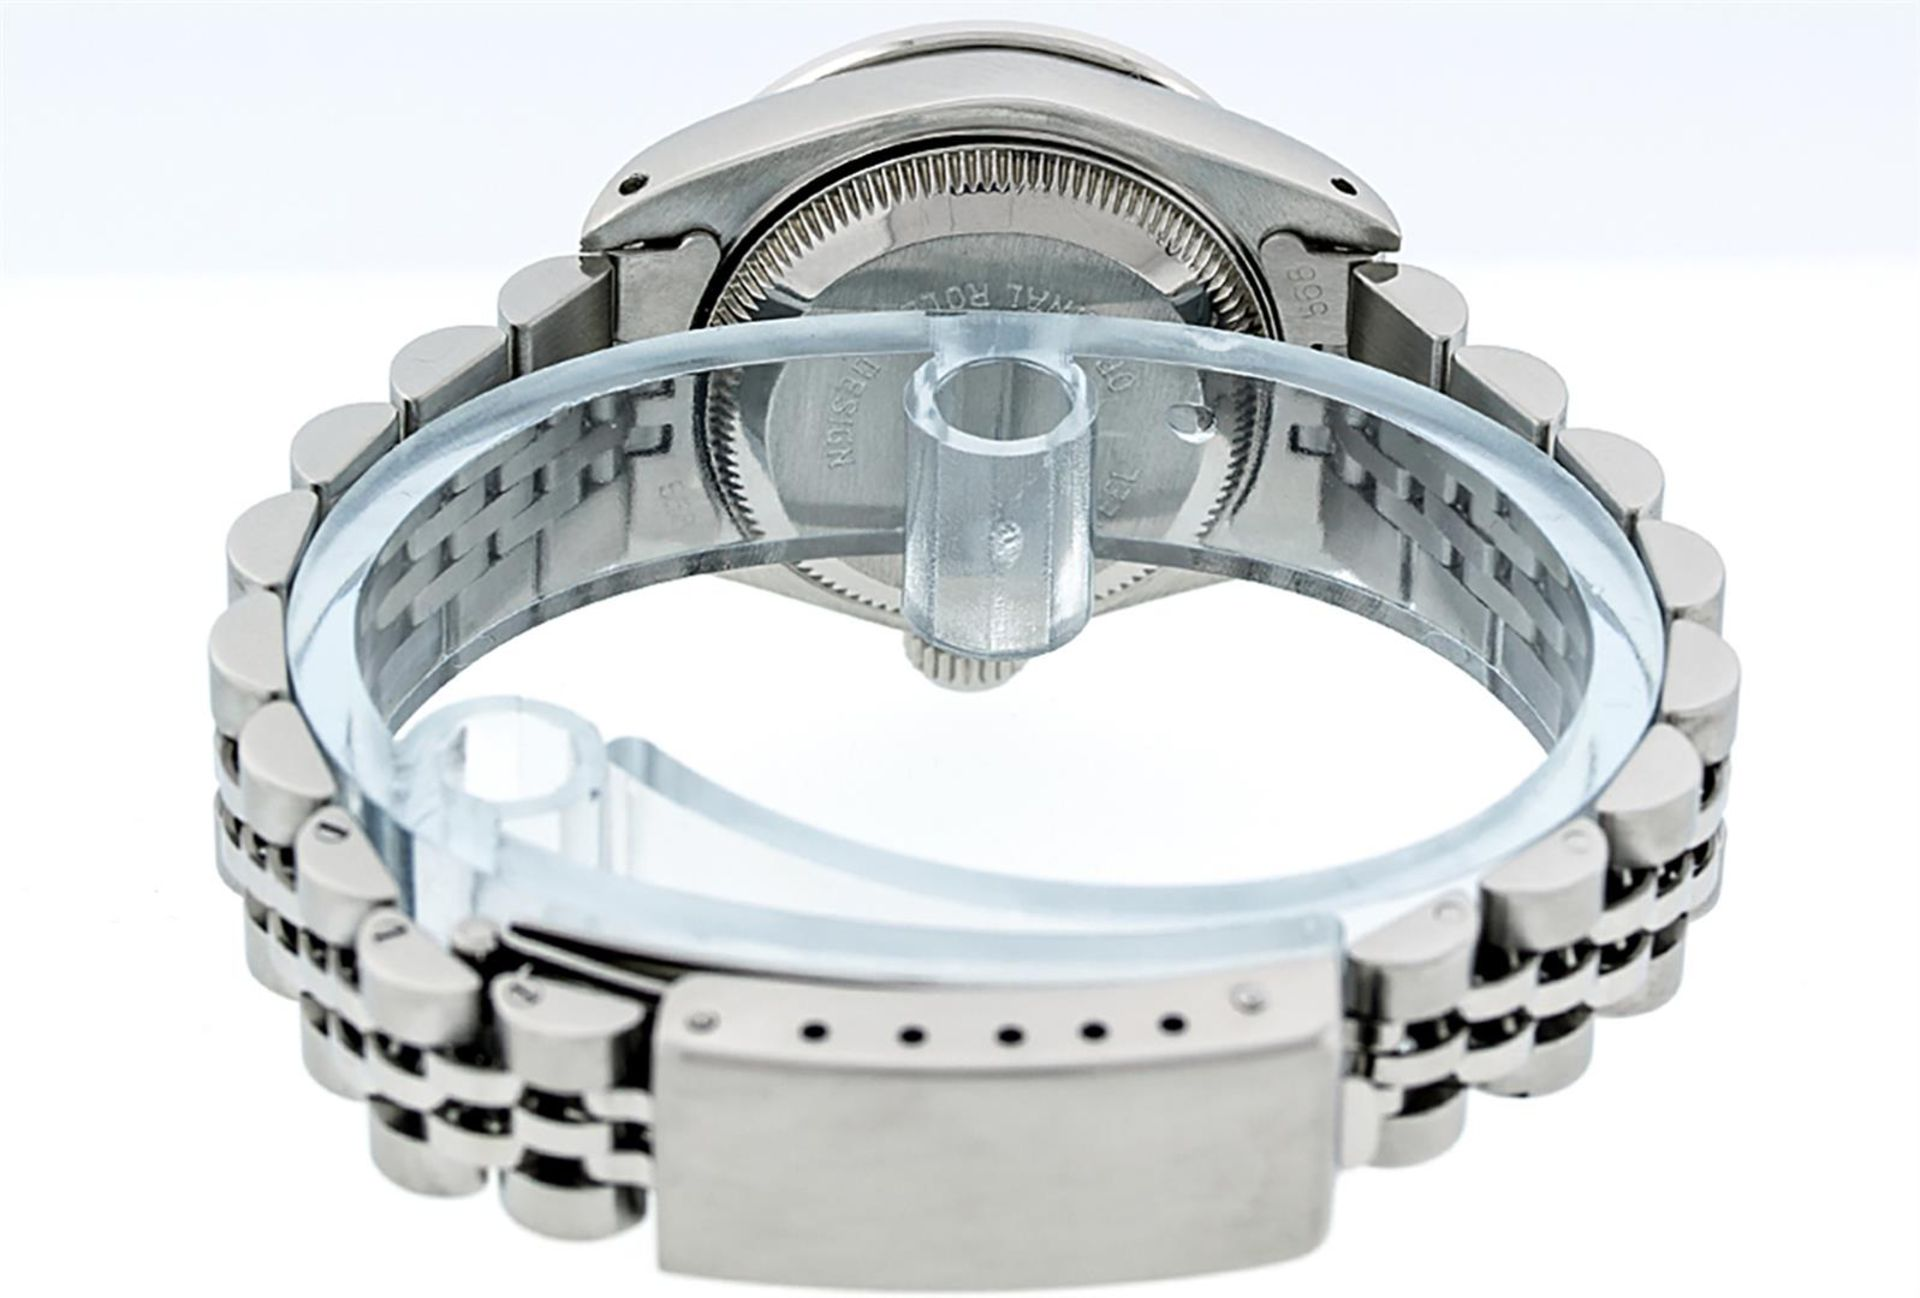 Rolex Ladies Stainless Steel 26MM Black String Diamond Lugs Datejust Wristwatch - Image 7 of 9